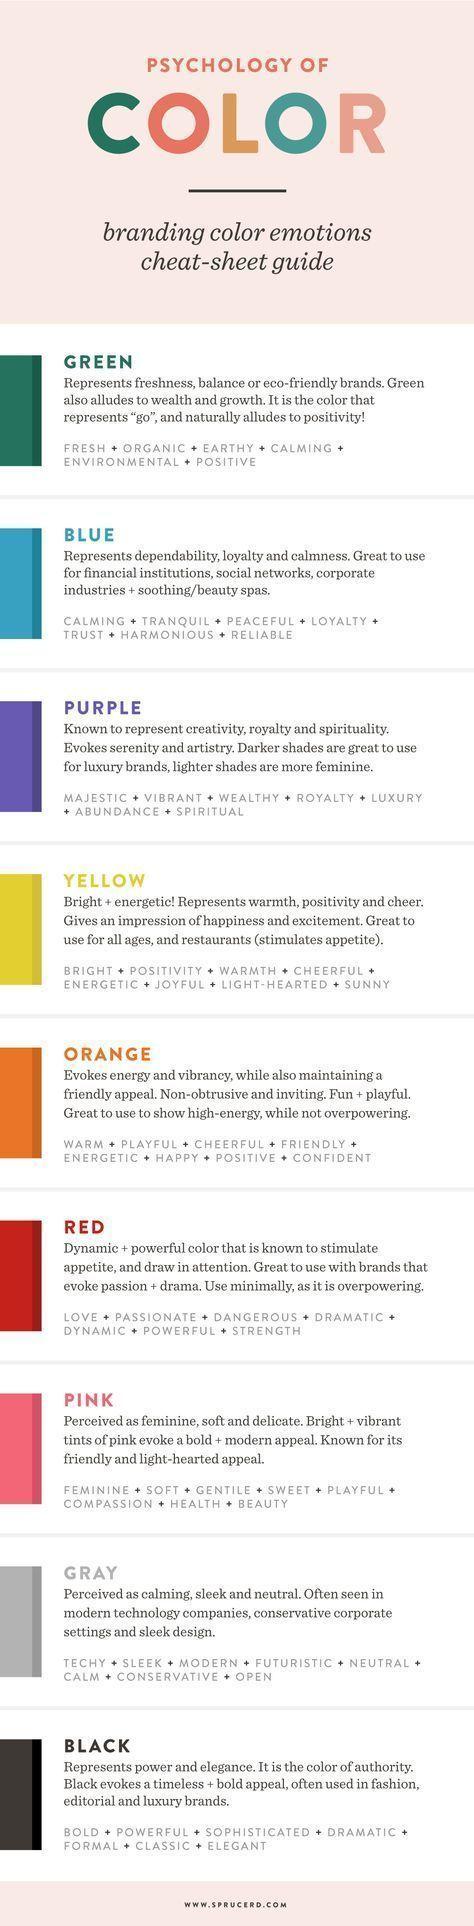 Psychology of Color in Branding   Spruce Rd. #branding #color #psychology